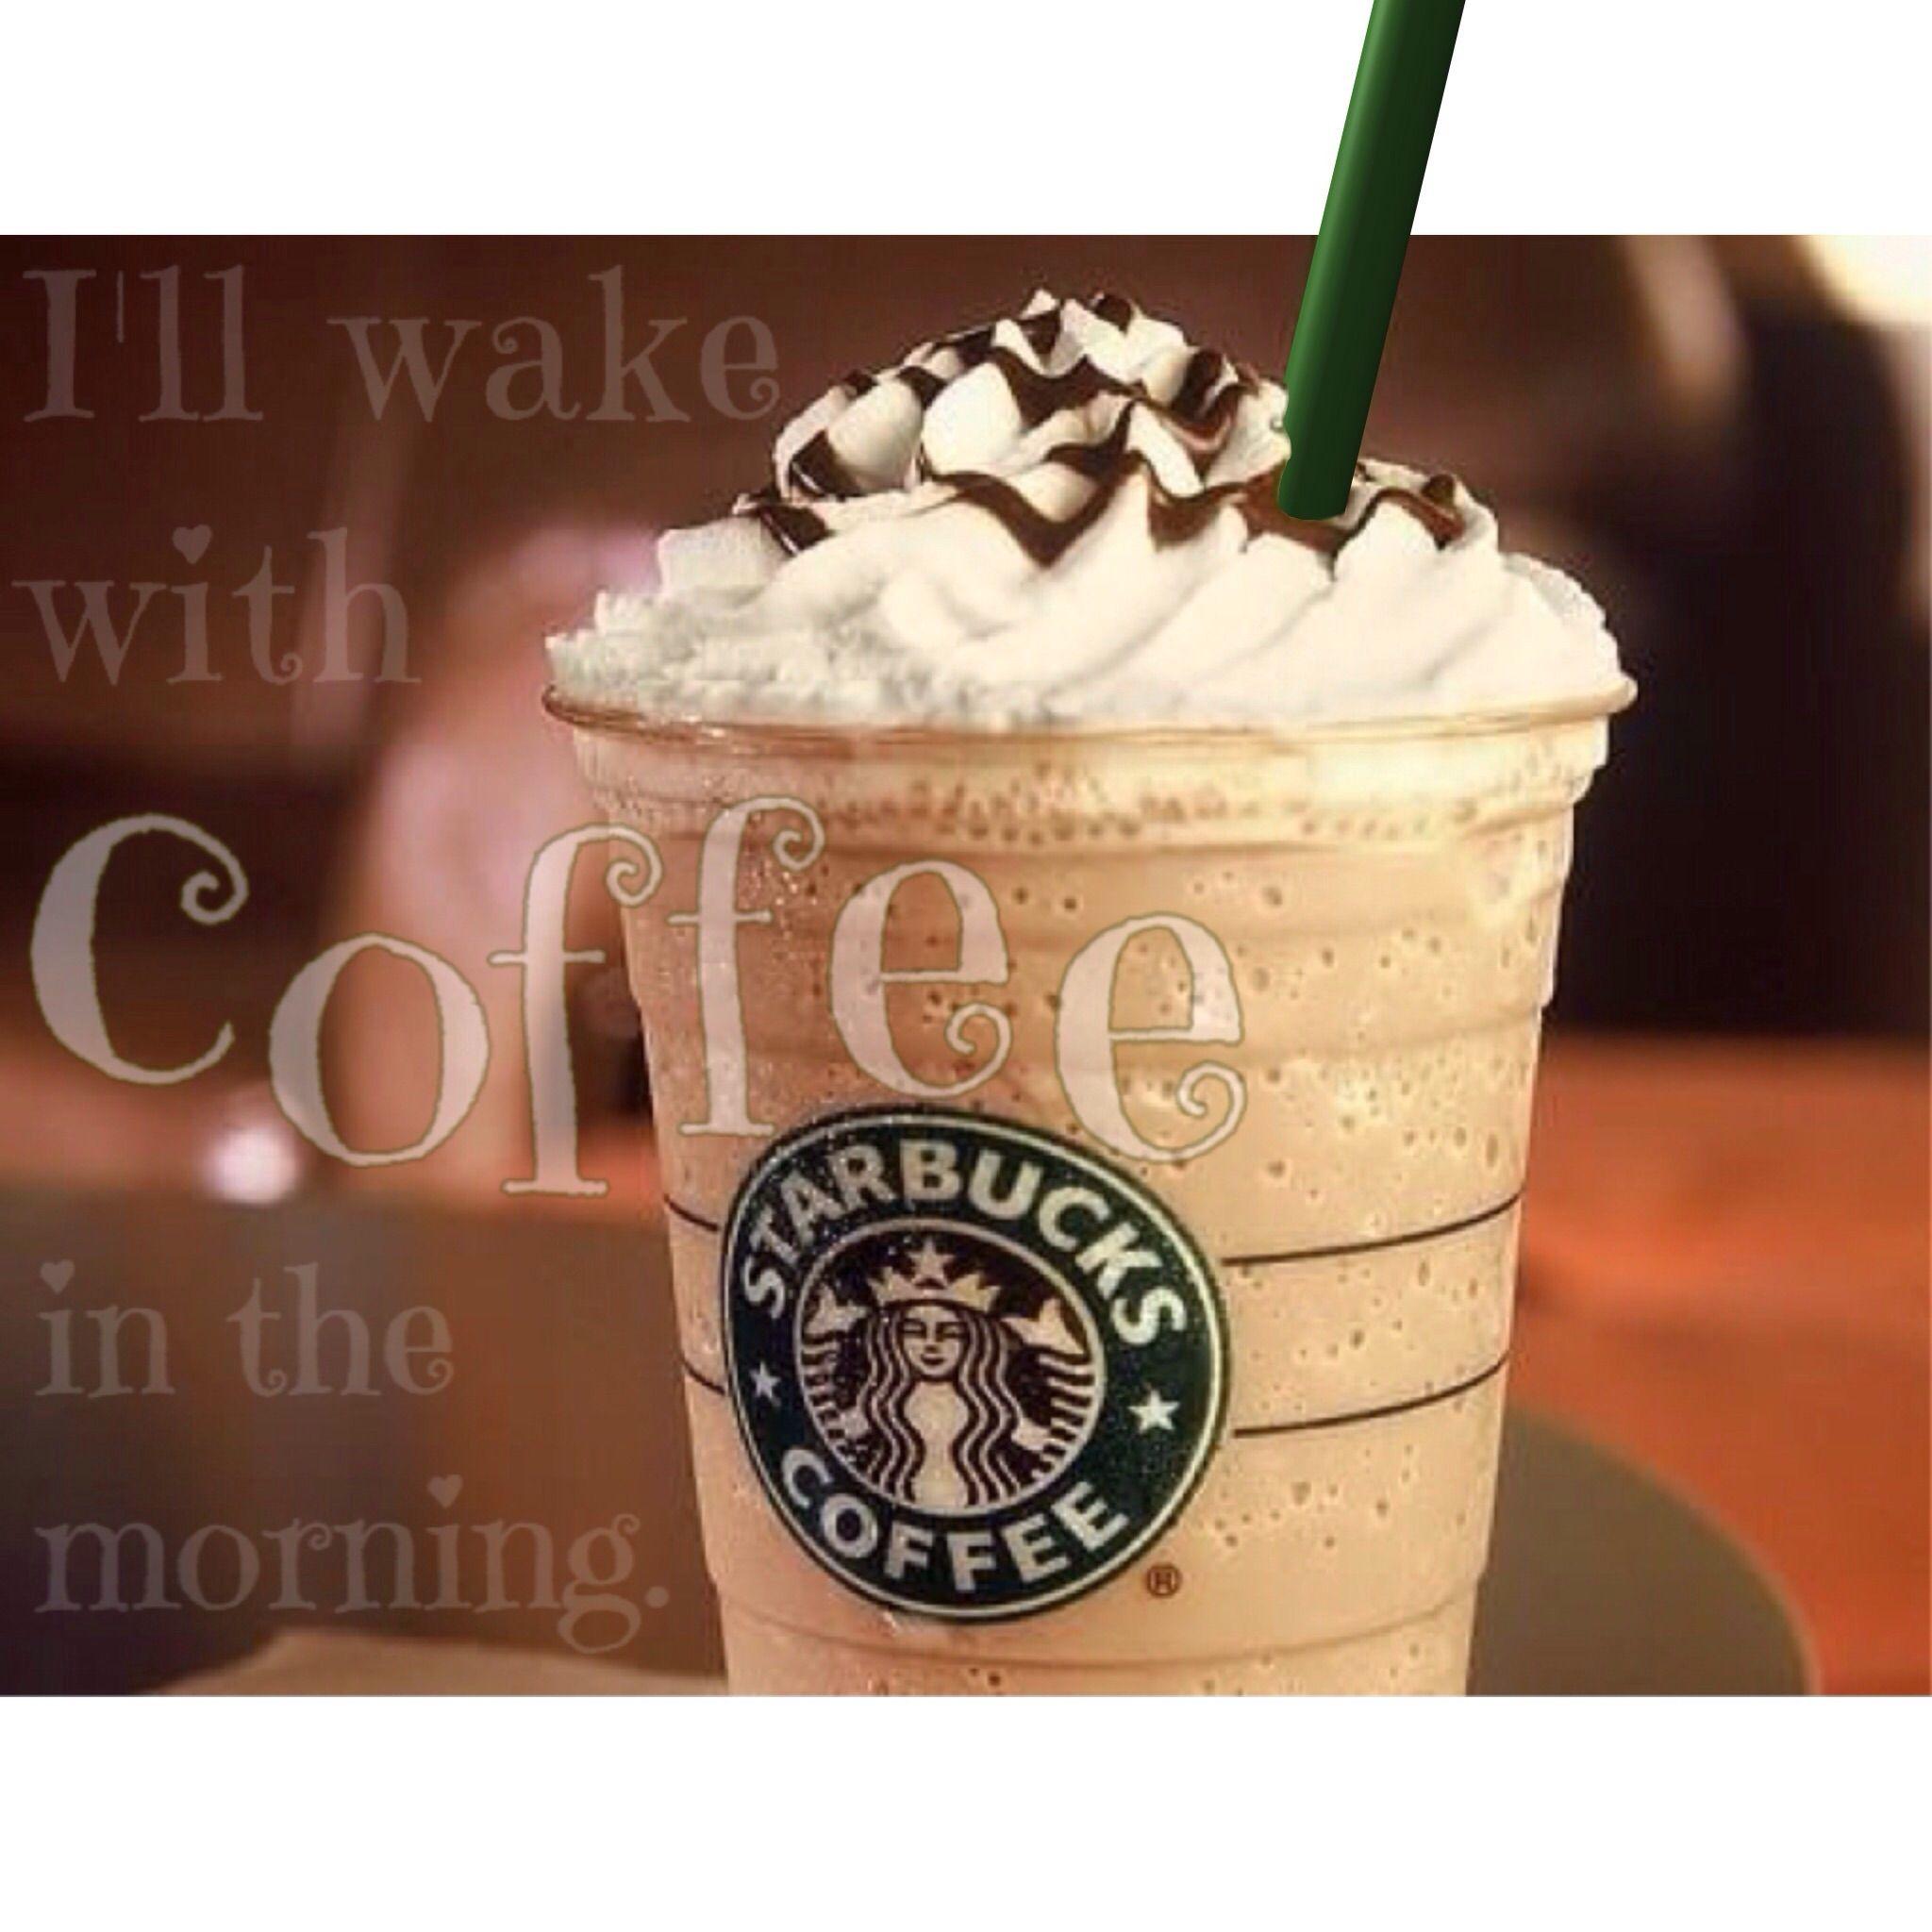 Cold Coffee Ed Sheeran Frozen coffee, Starbucks